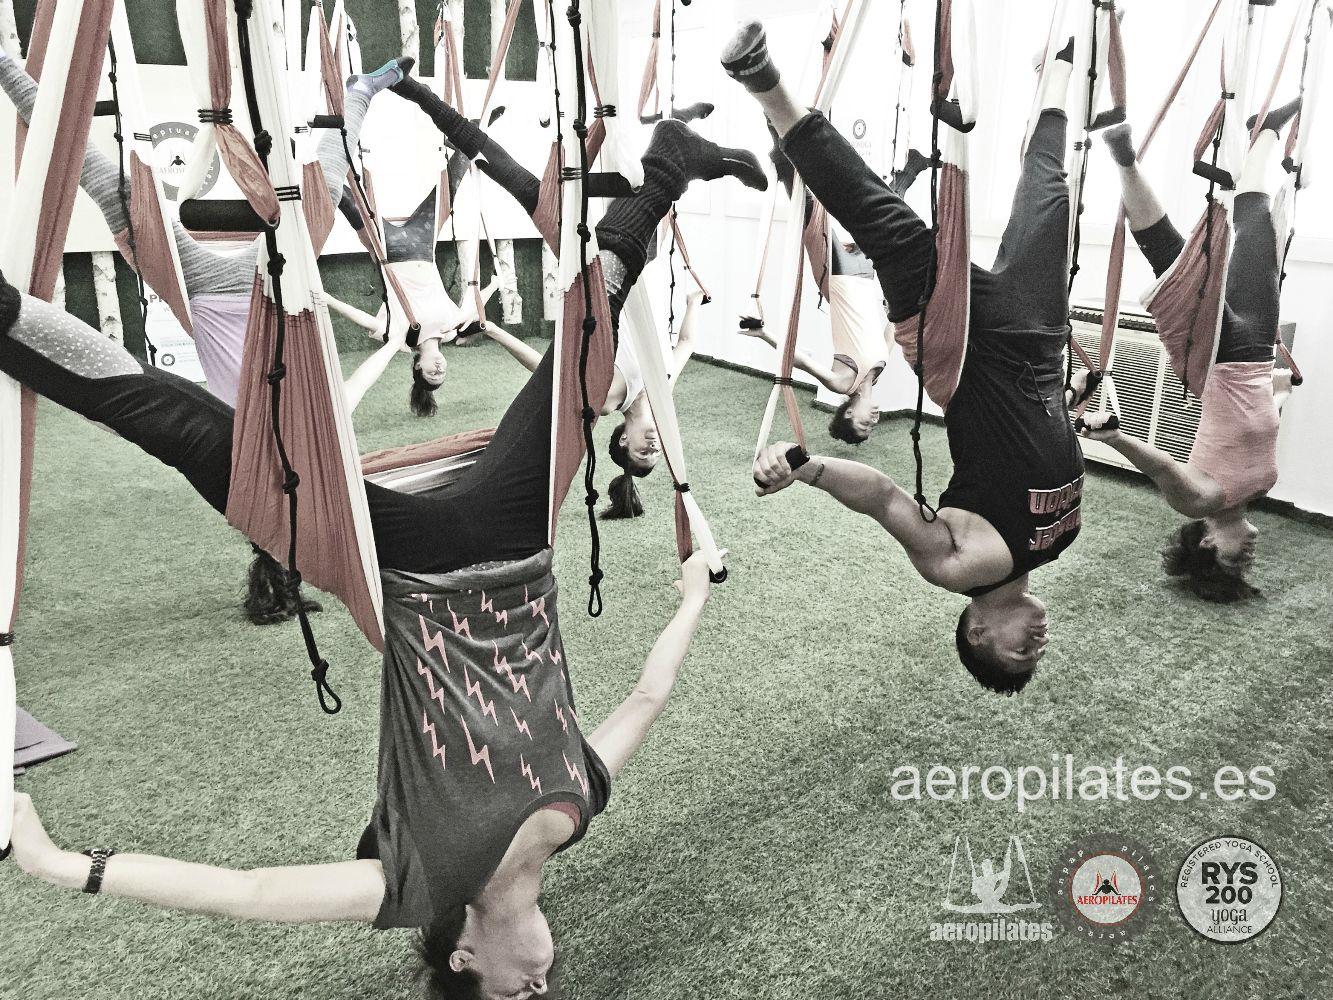 Pilates Aereo Pilates Columpio Cursos Aeropilates Aeroyoga Aeroyogaoficial Aeropilates Aeropilatesoficial Wellness Ae Zumba Workout Yoga Postures Yoga